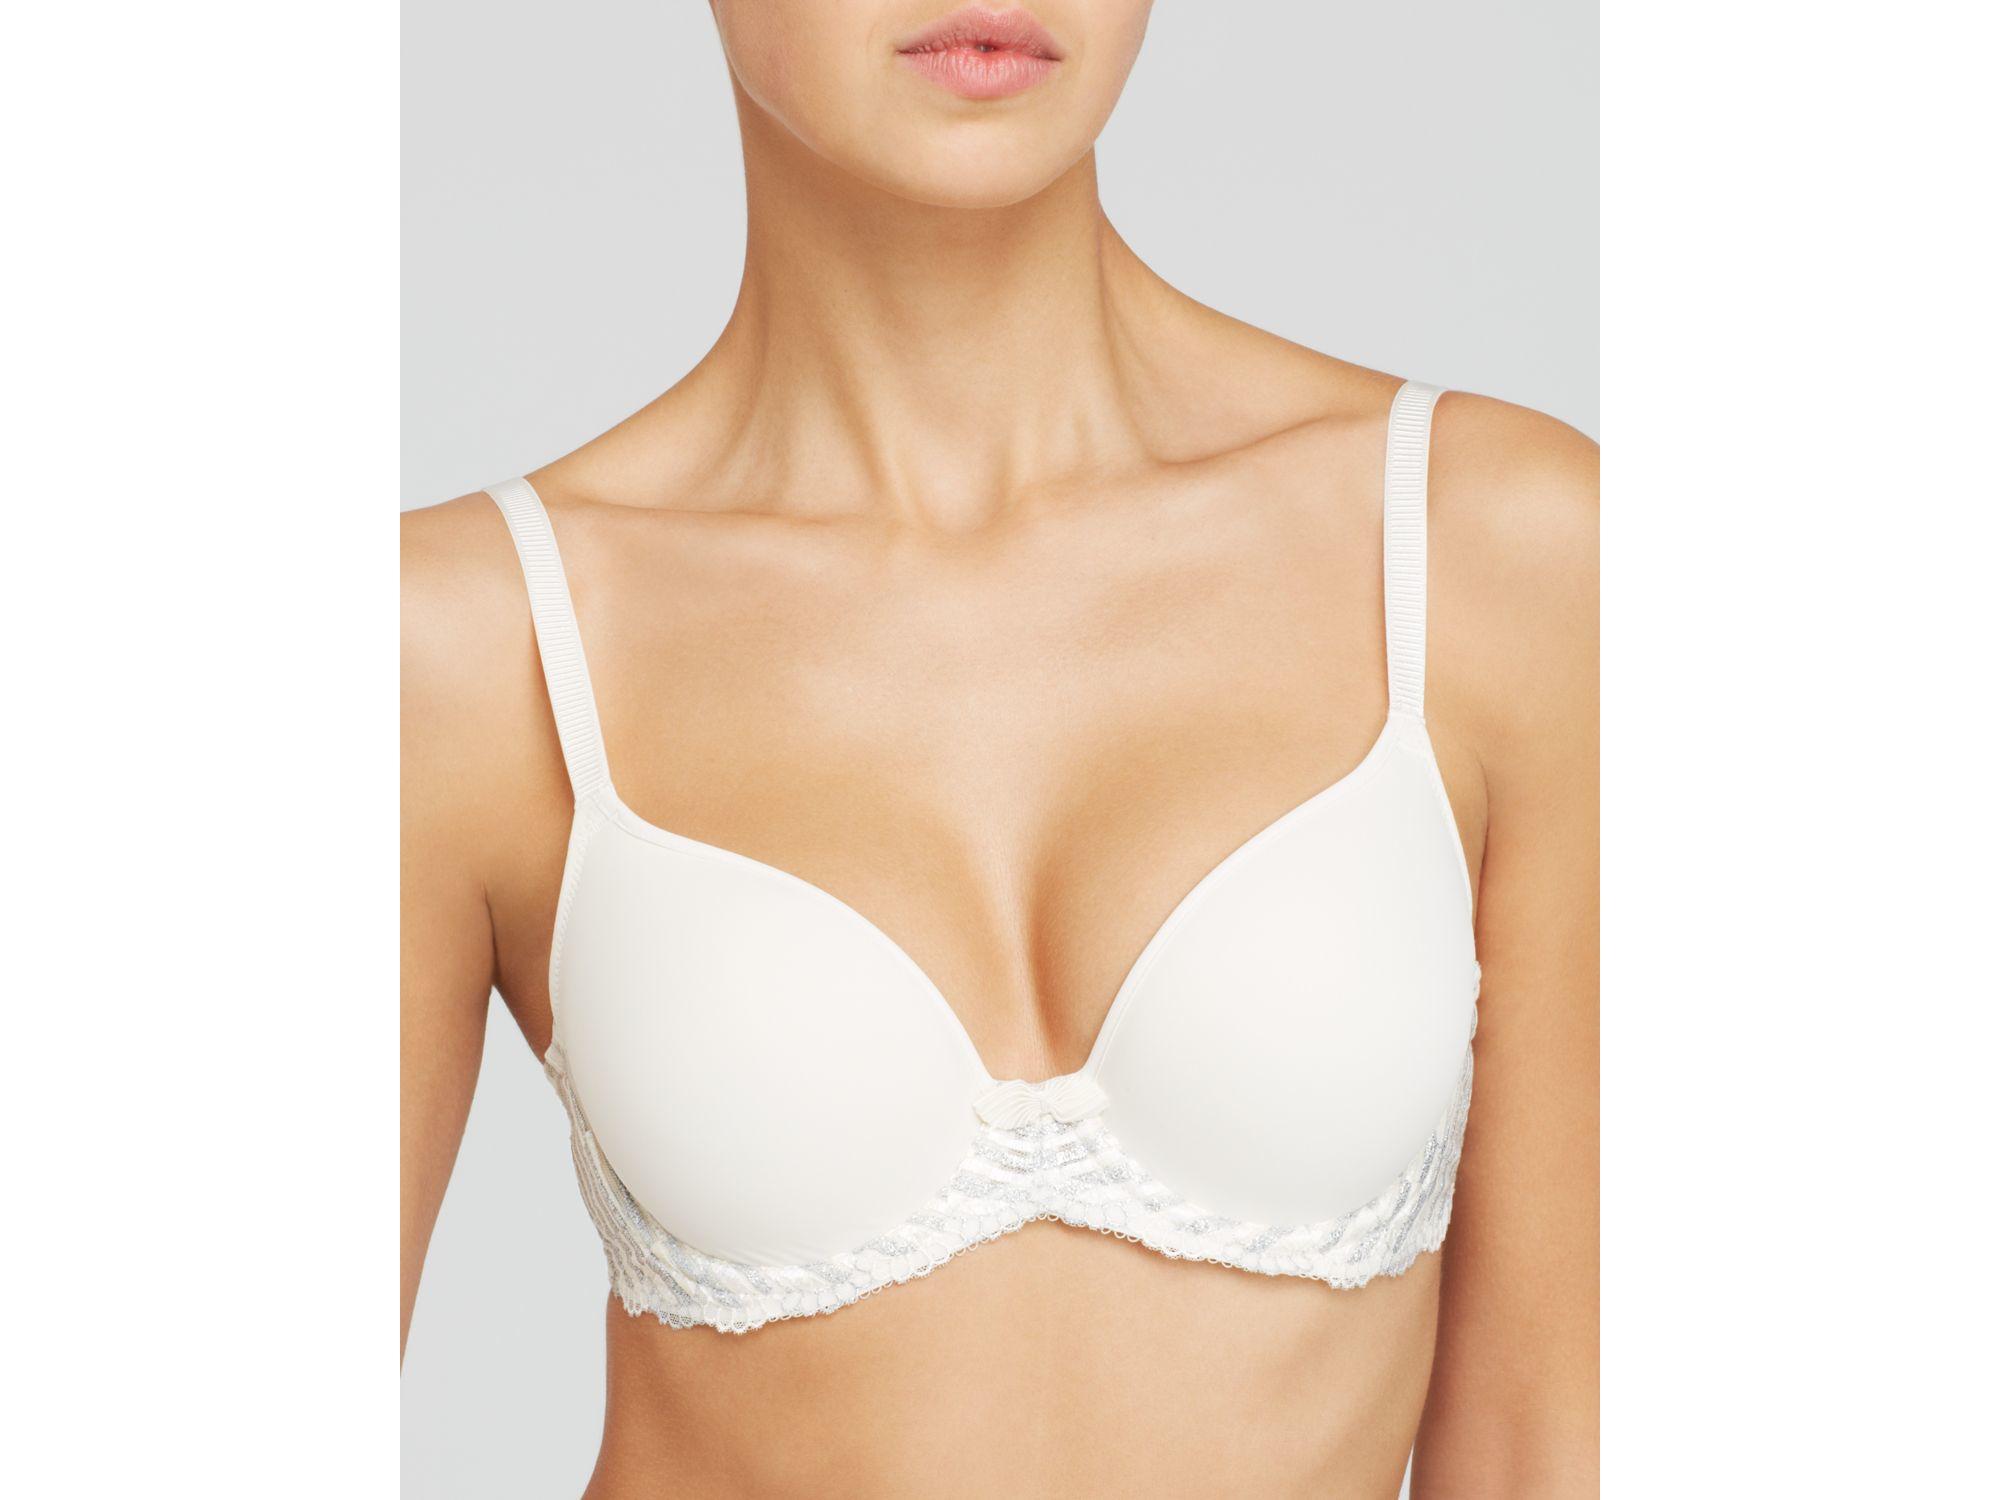 8d3f7cff02 Lyst - Wacoal Bra - La Femme Contour Demi  853217 in White